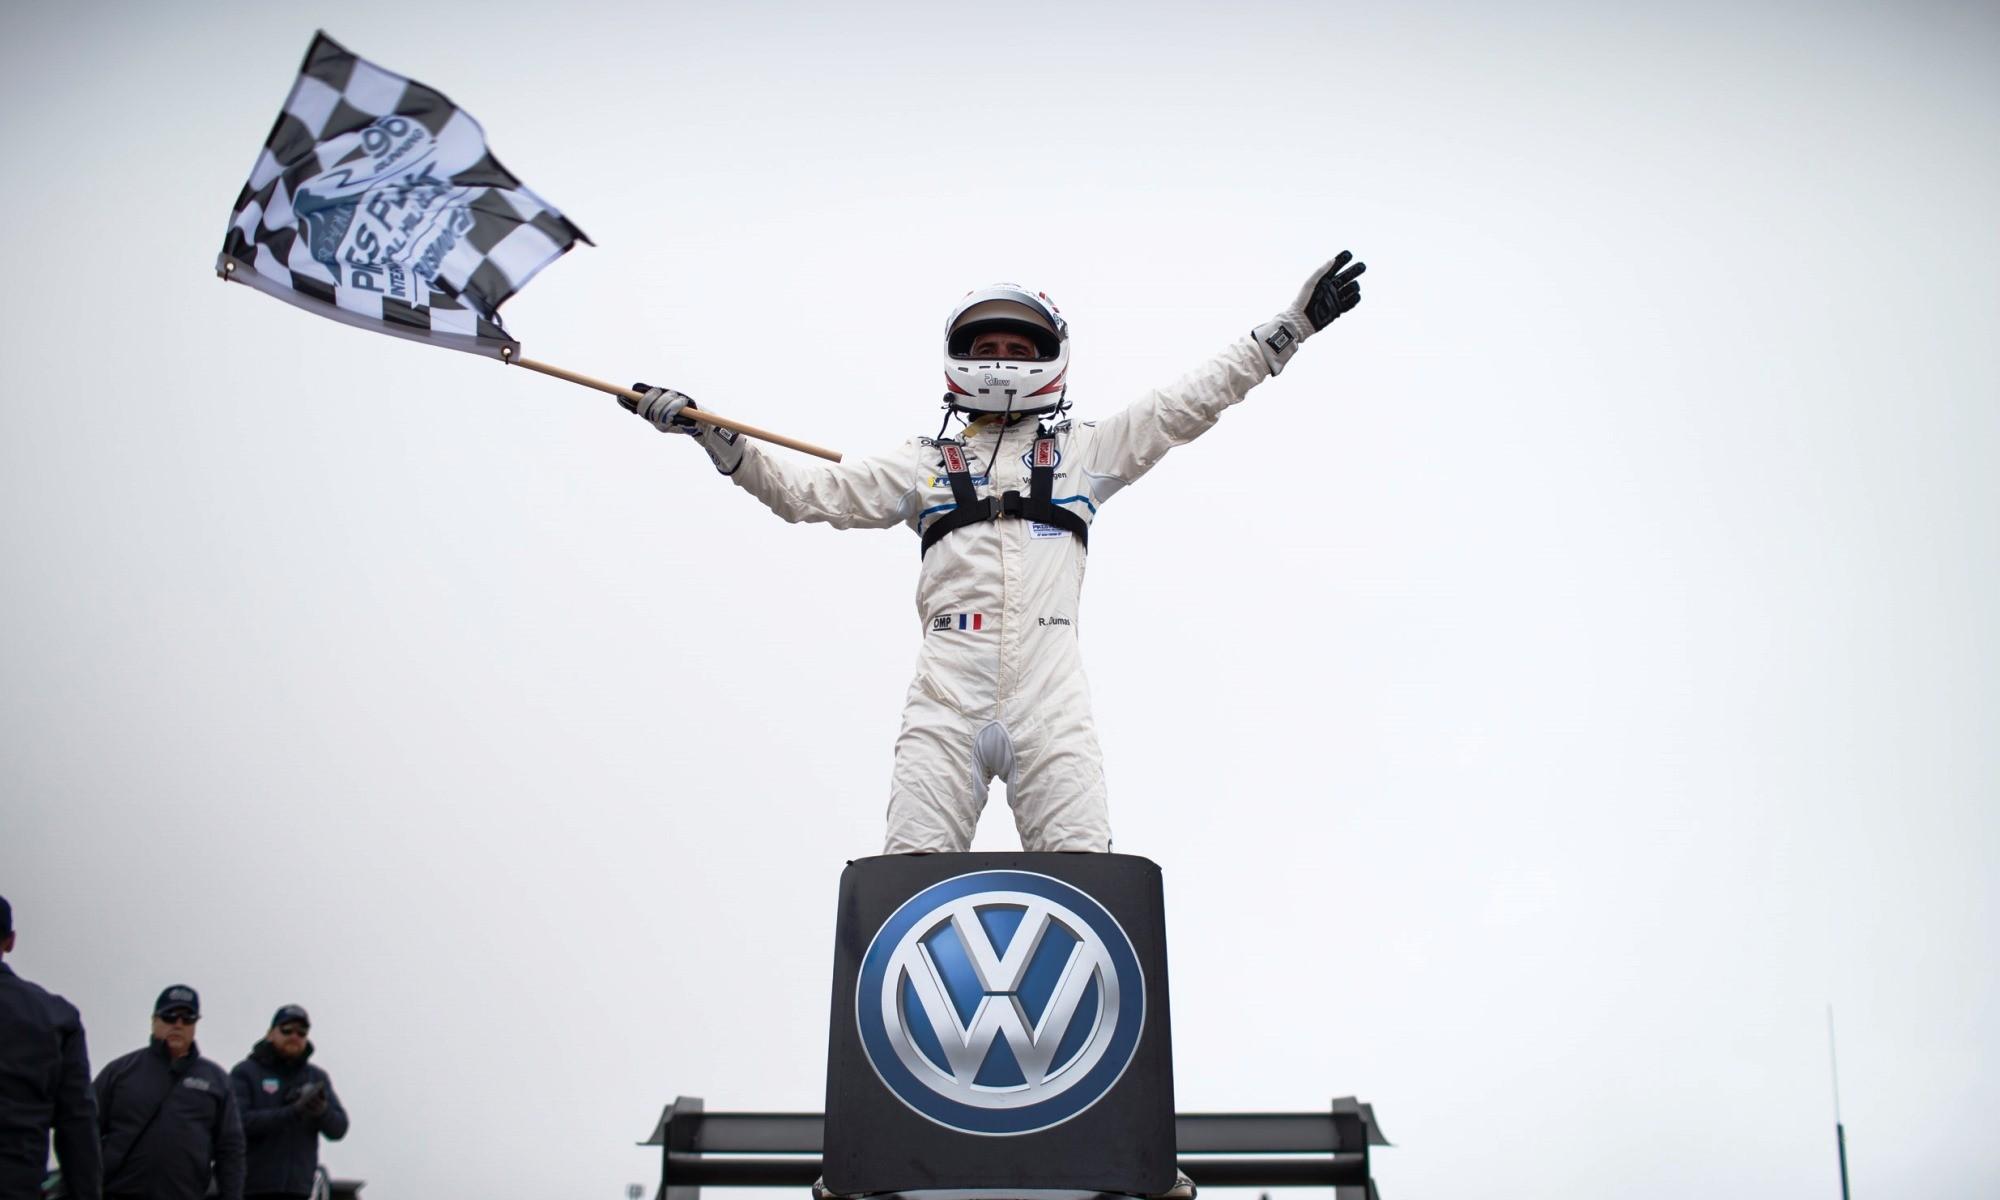 Dumas celebrates his win and new record